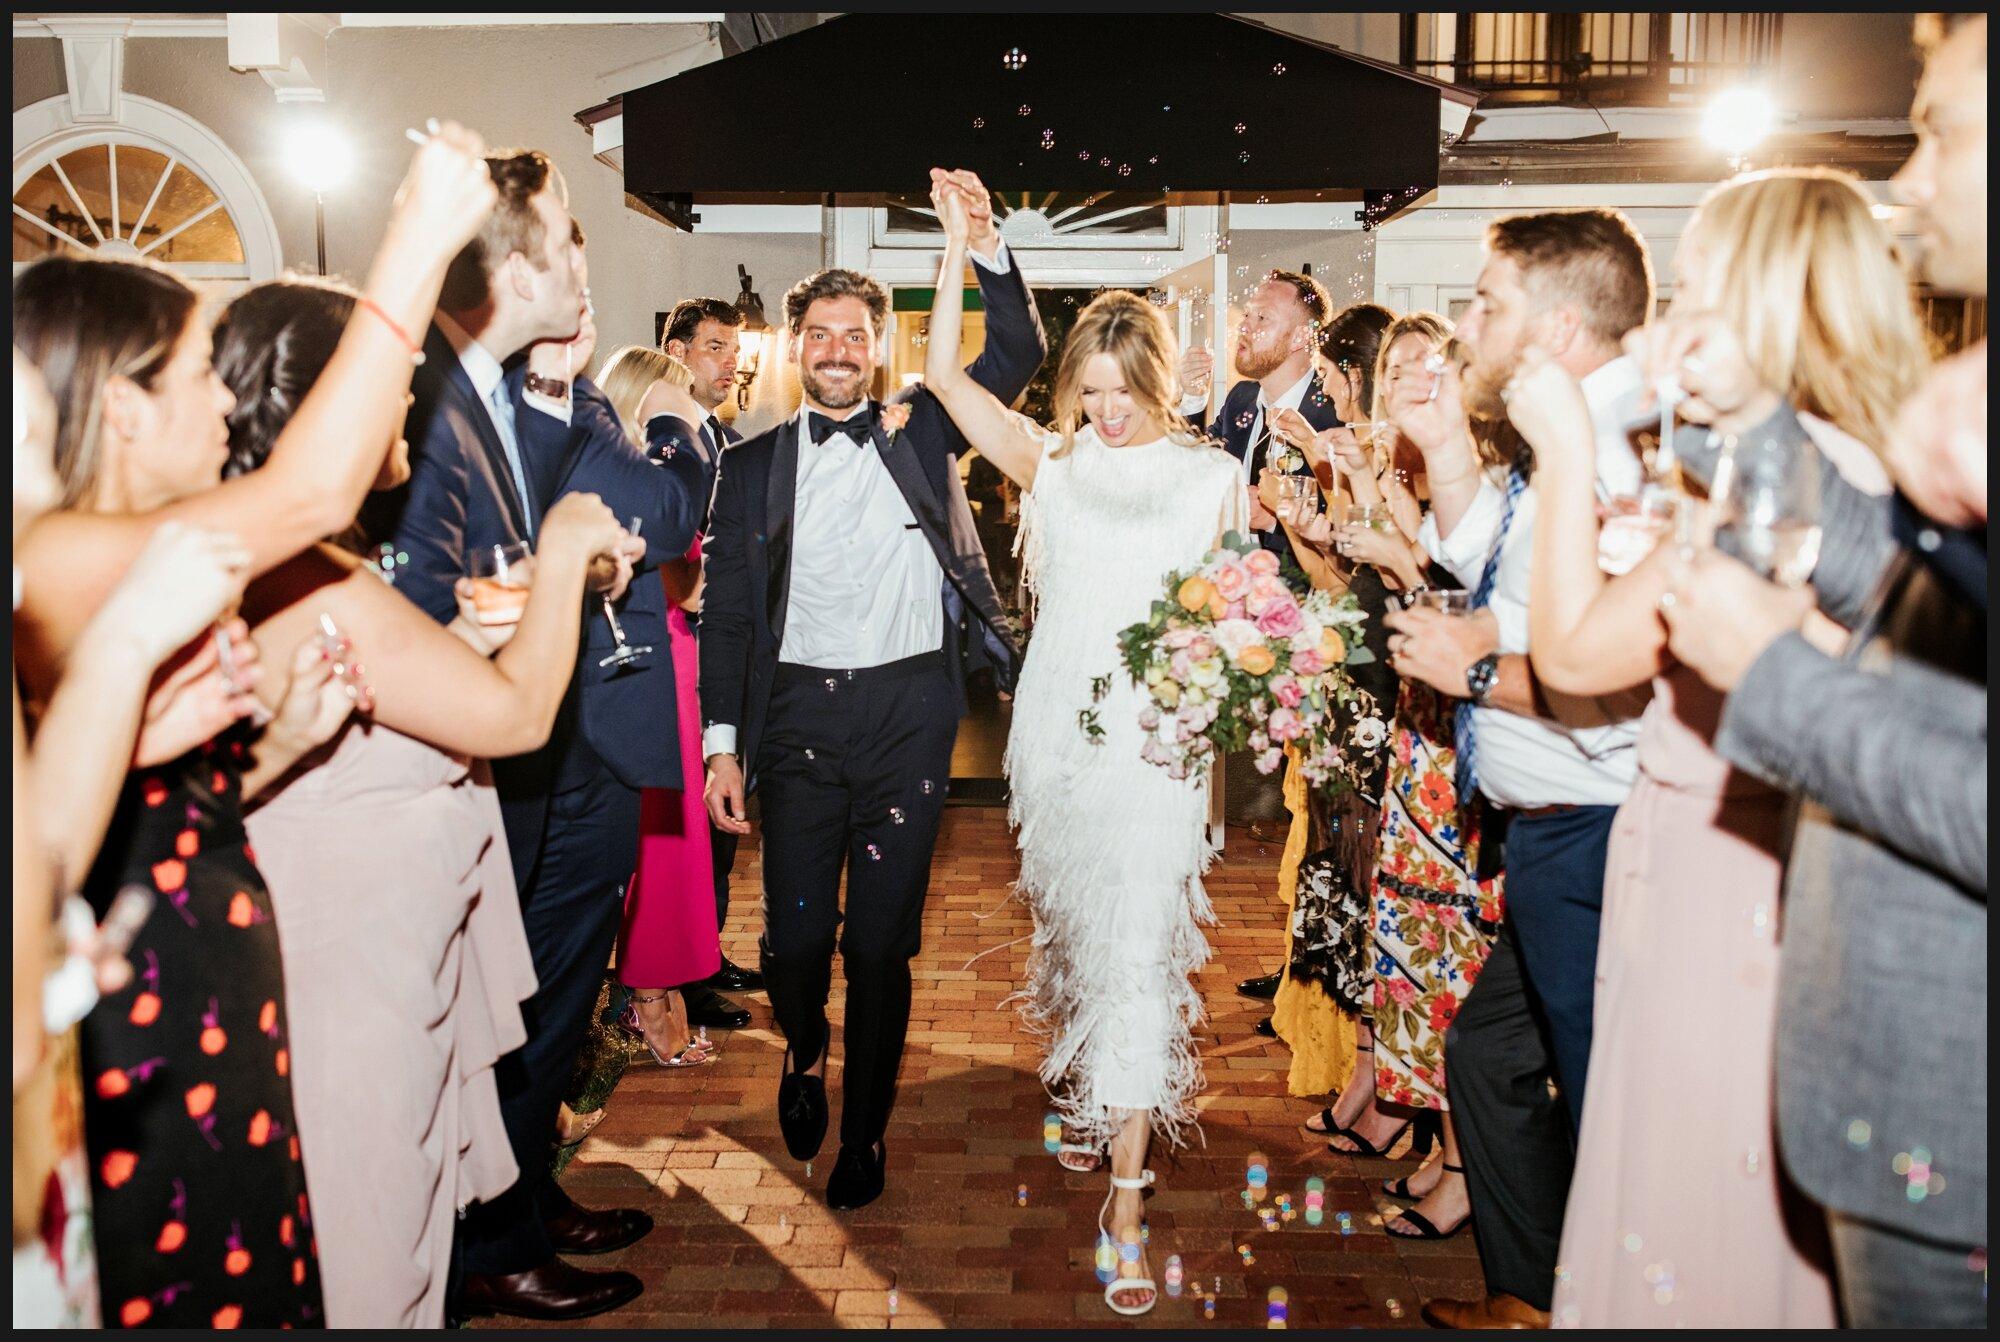 Orlando-Wedding-Photographer-destination-wedding-photographer-florida-wedding-photographer-hawaii-wedding-photographer_0771.jpg